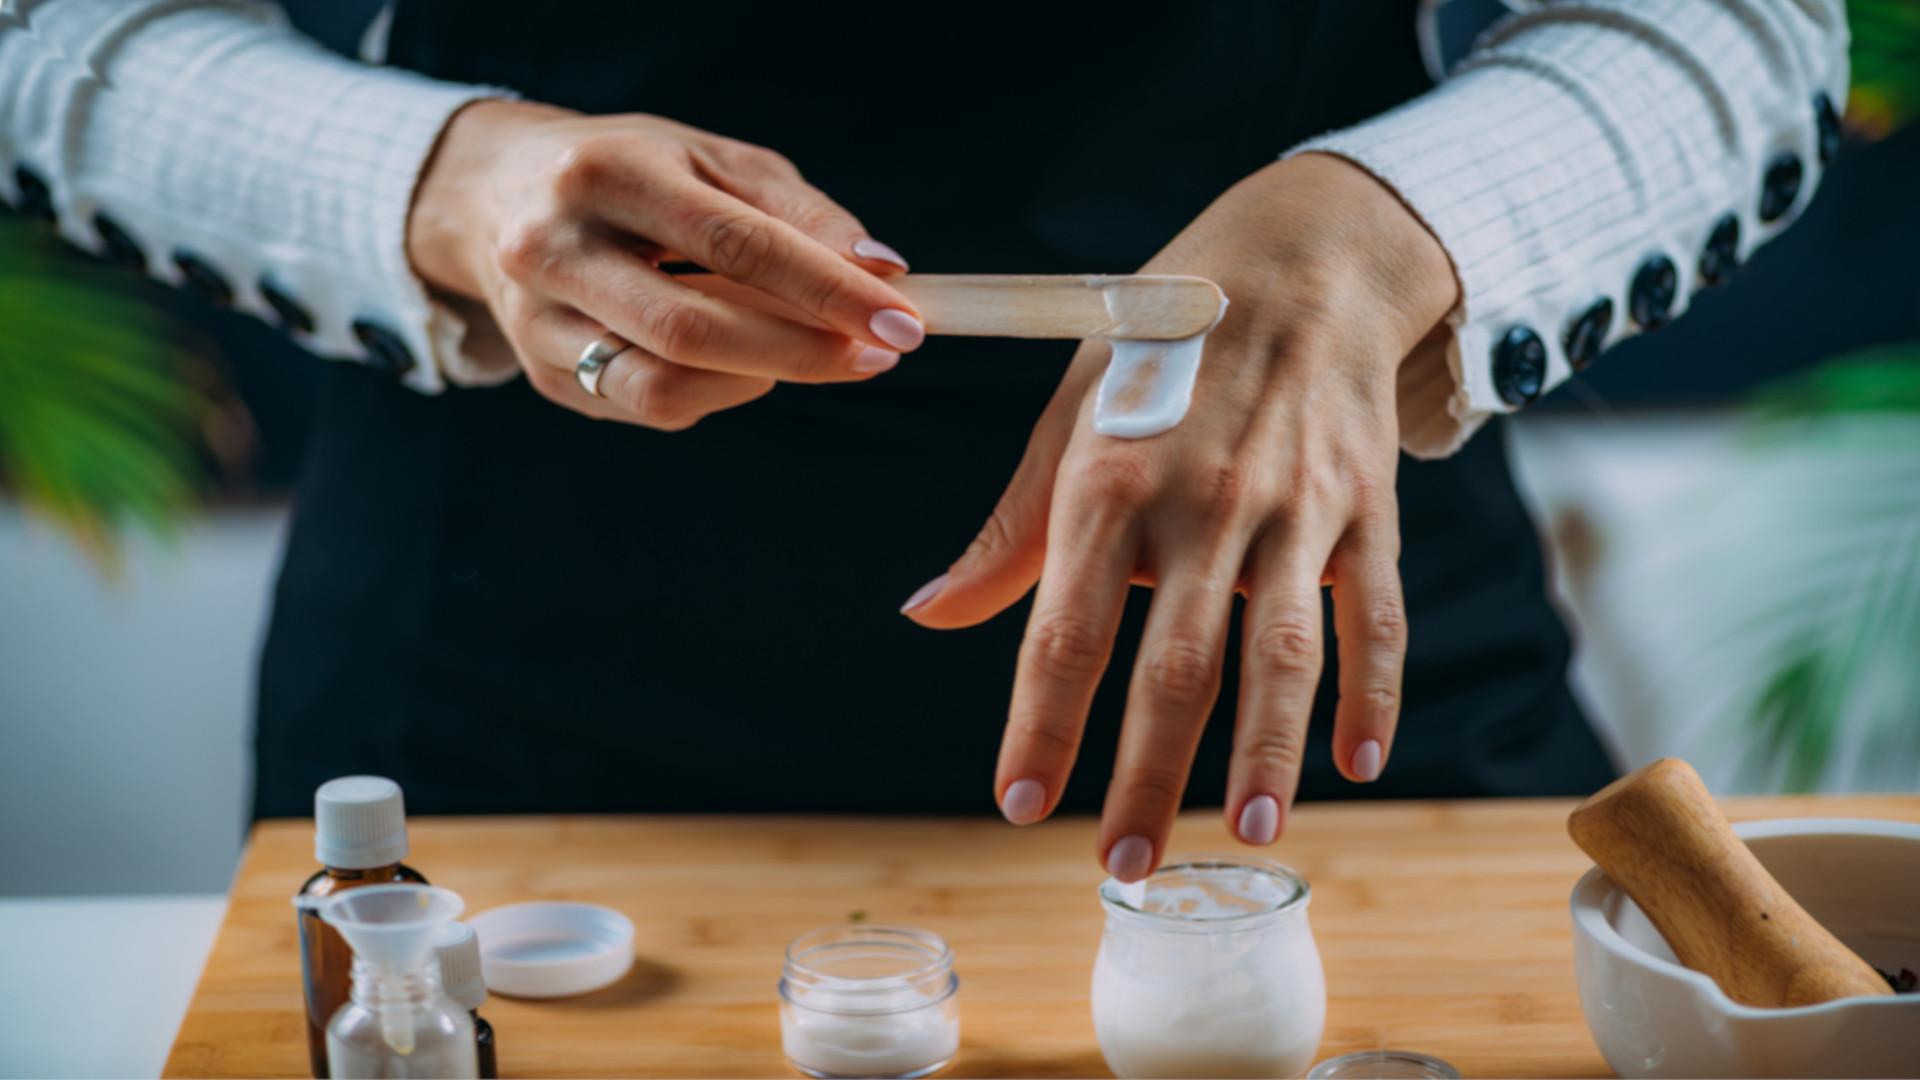 CBD Handcreme selbst gemacht – DIY-Handcreme mit CBD-Öl